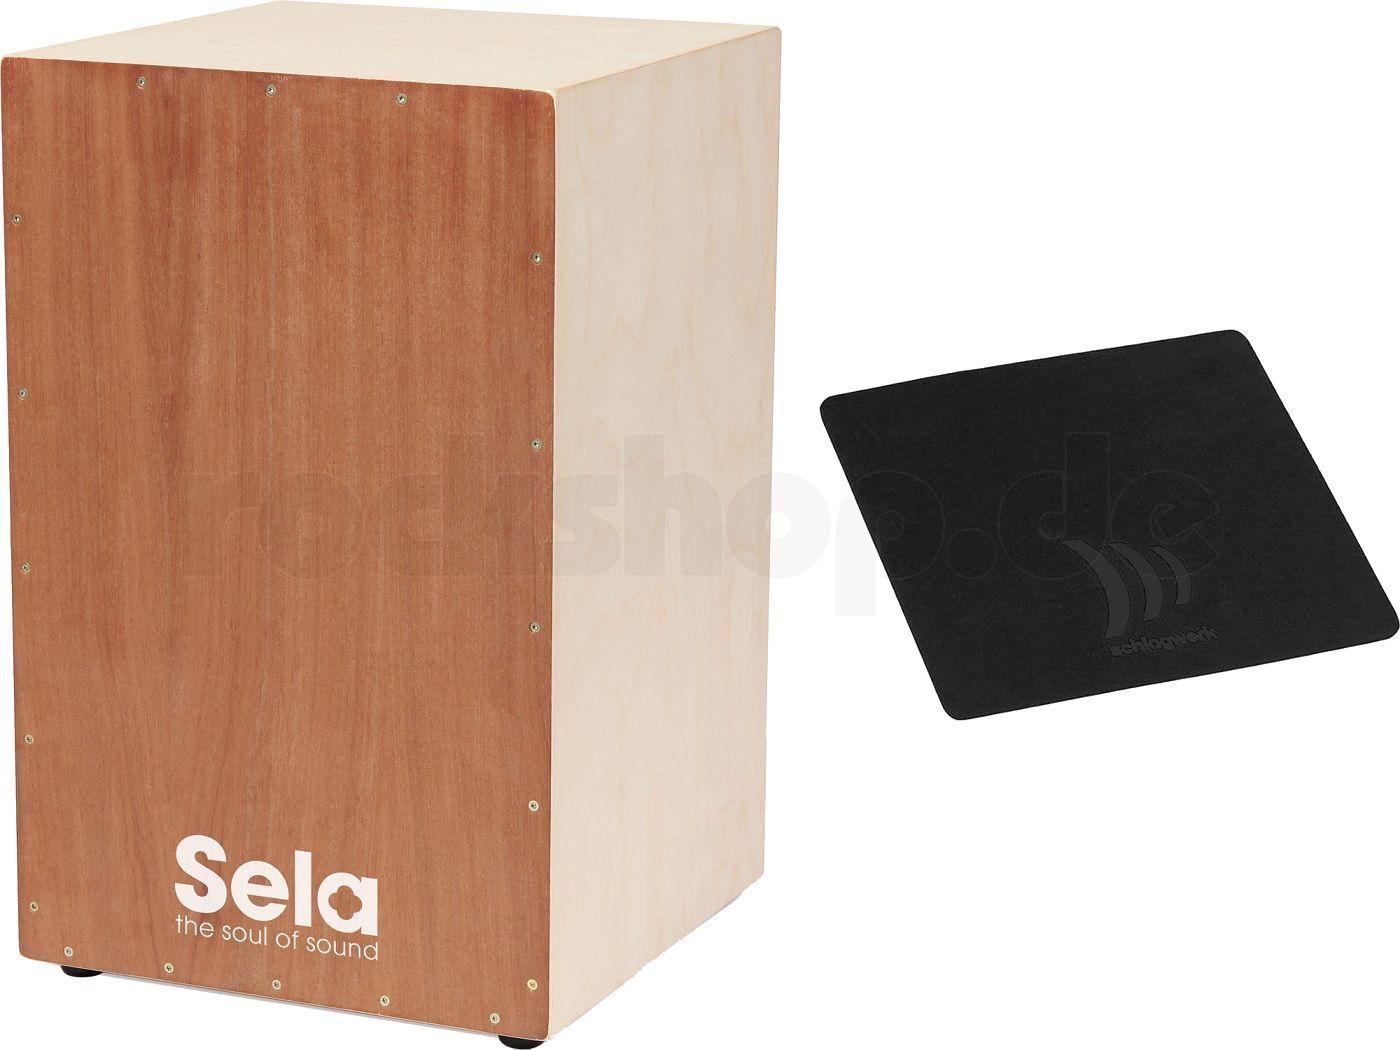 Sela SE 001 Cajon Bausatz mit Werkzeug + Cajon Schule Buch CD + Pad Sitzauflage